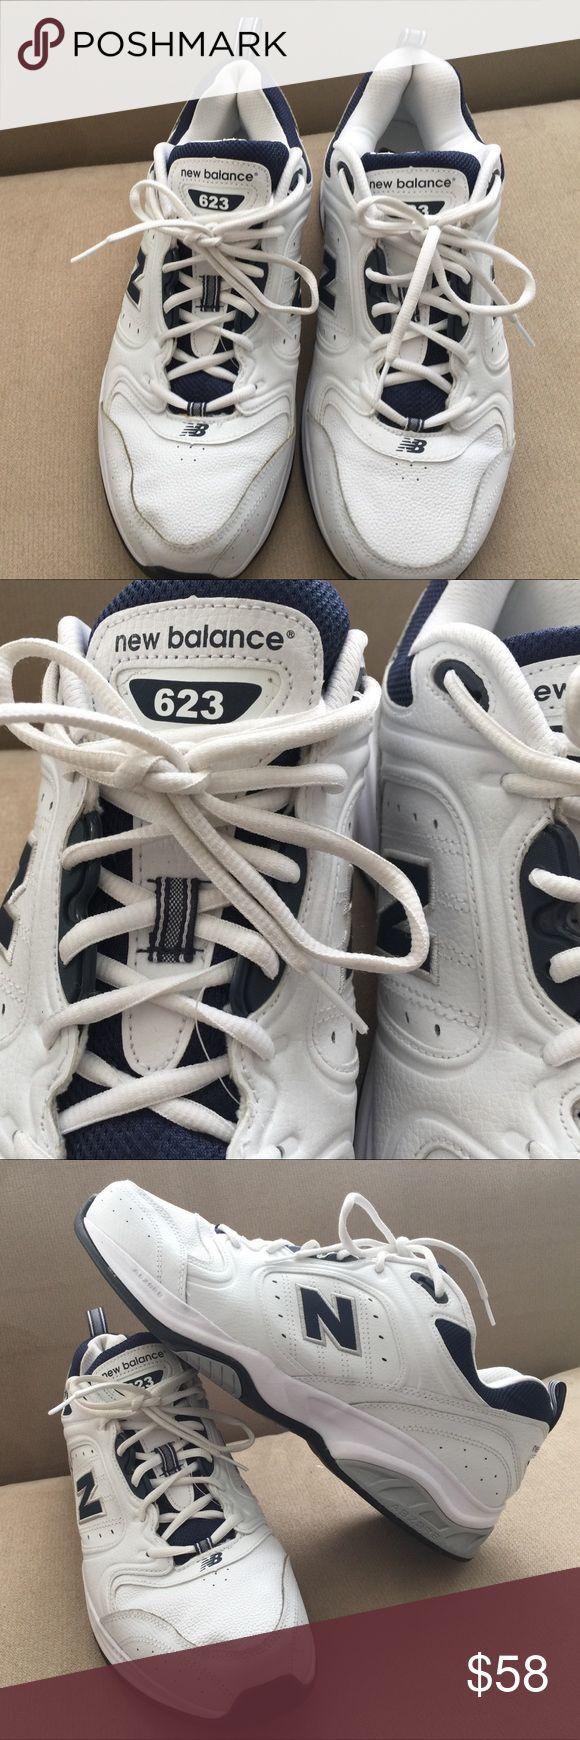 new balance 999 size 14